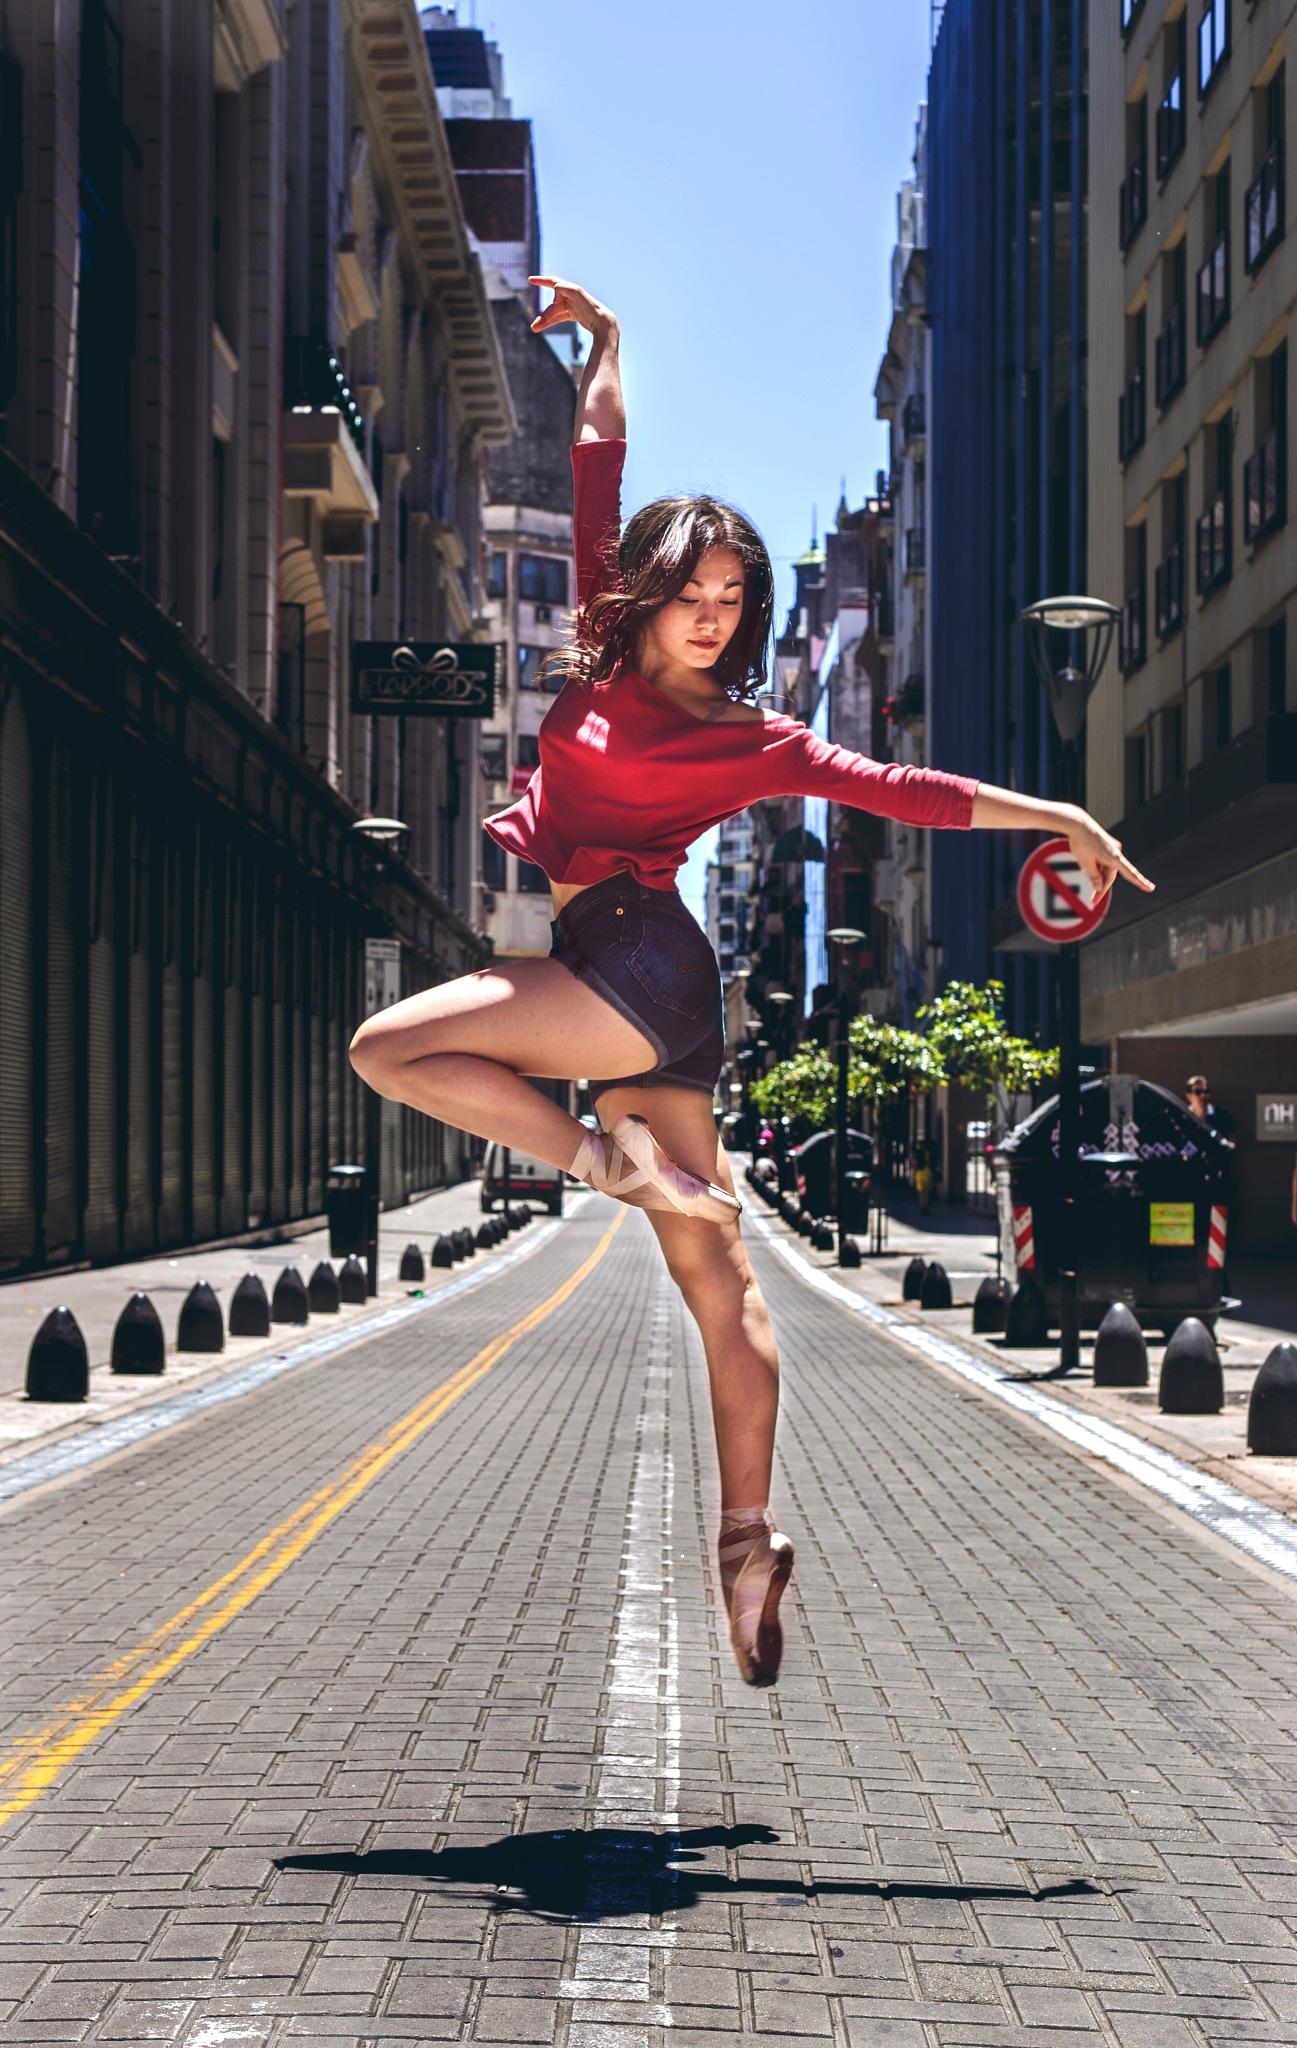 Ballerina by Pablo Zamora